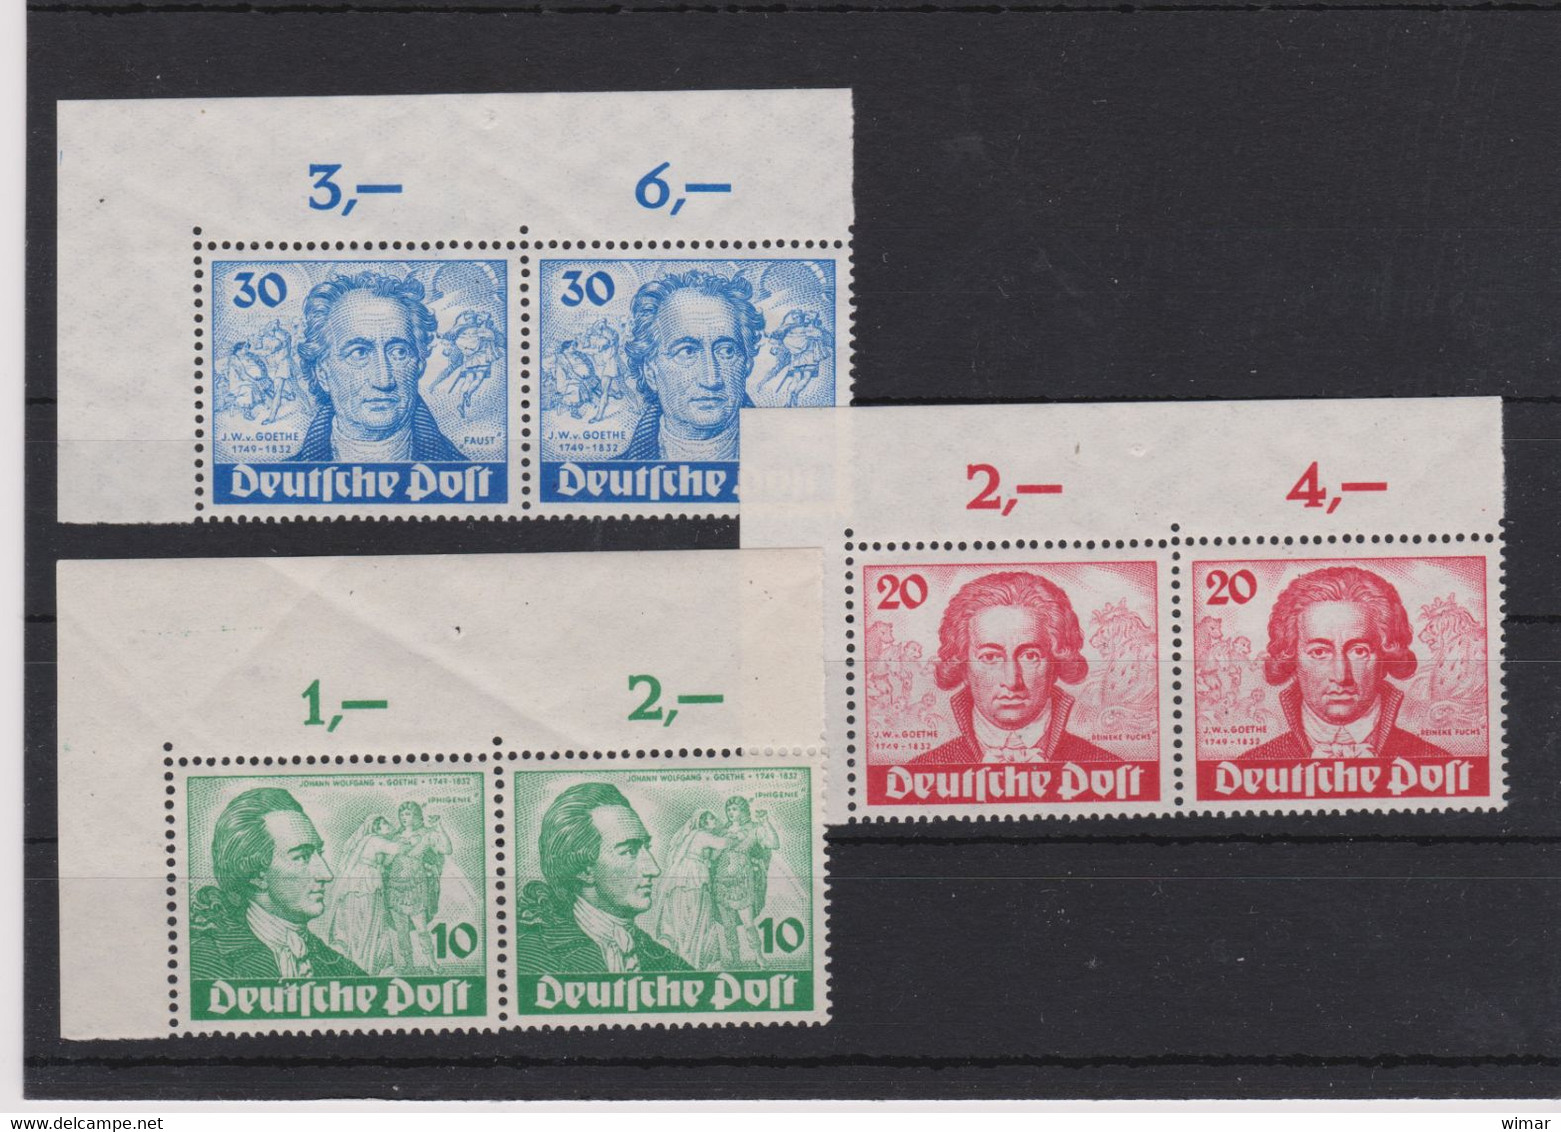 Berlin (West) 1949 200. Geburtstag Von J.W. Von Goethe Mi 61-63 ** Superbe Waagerechte Paare Als Obere Eckrandstücke - Unused Stamps